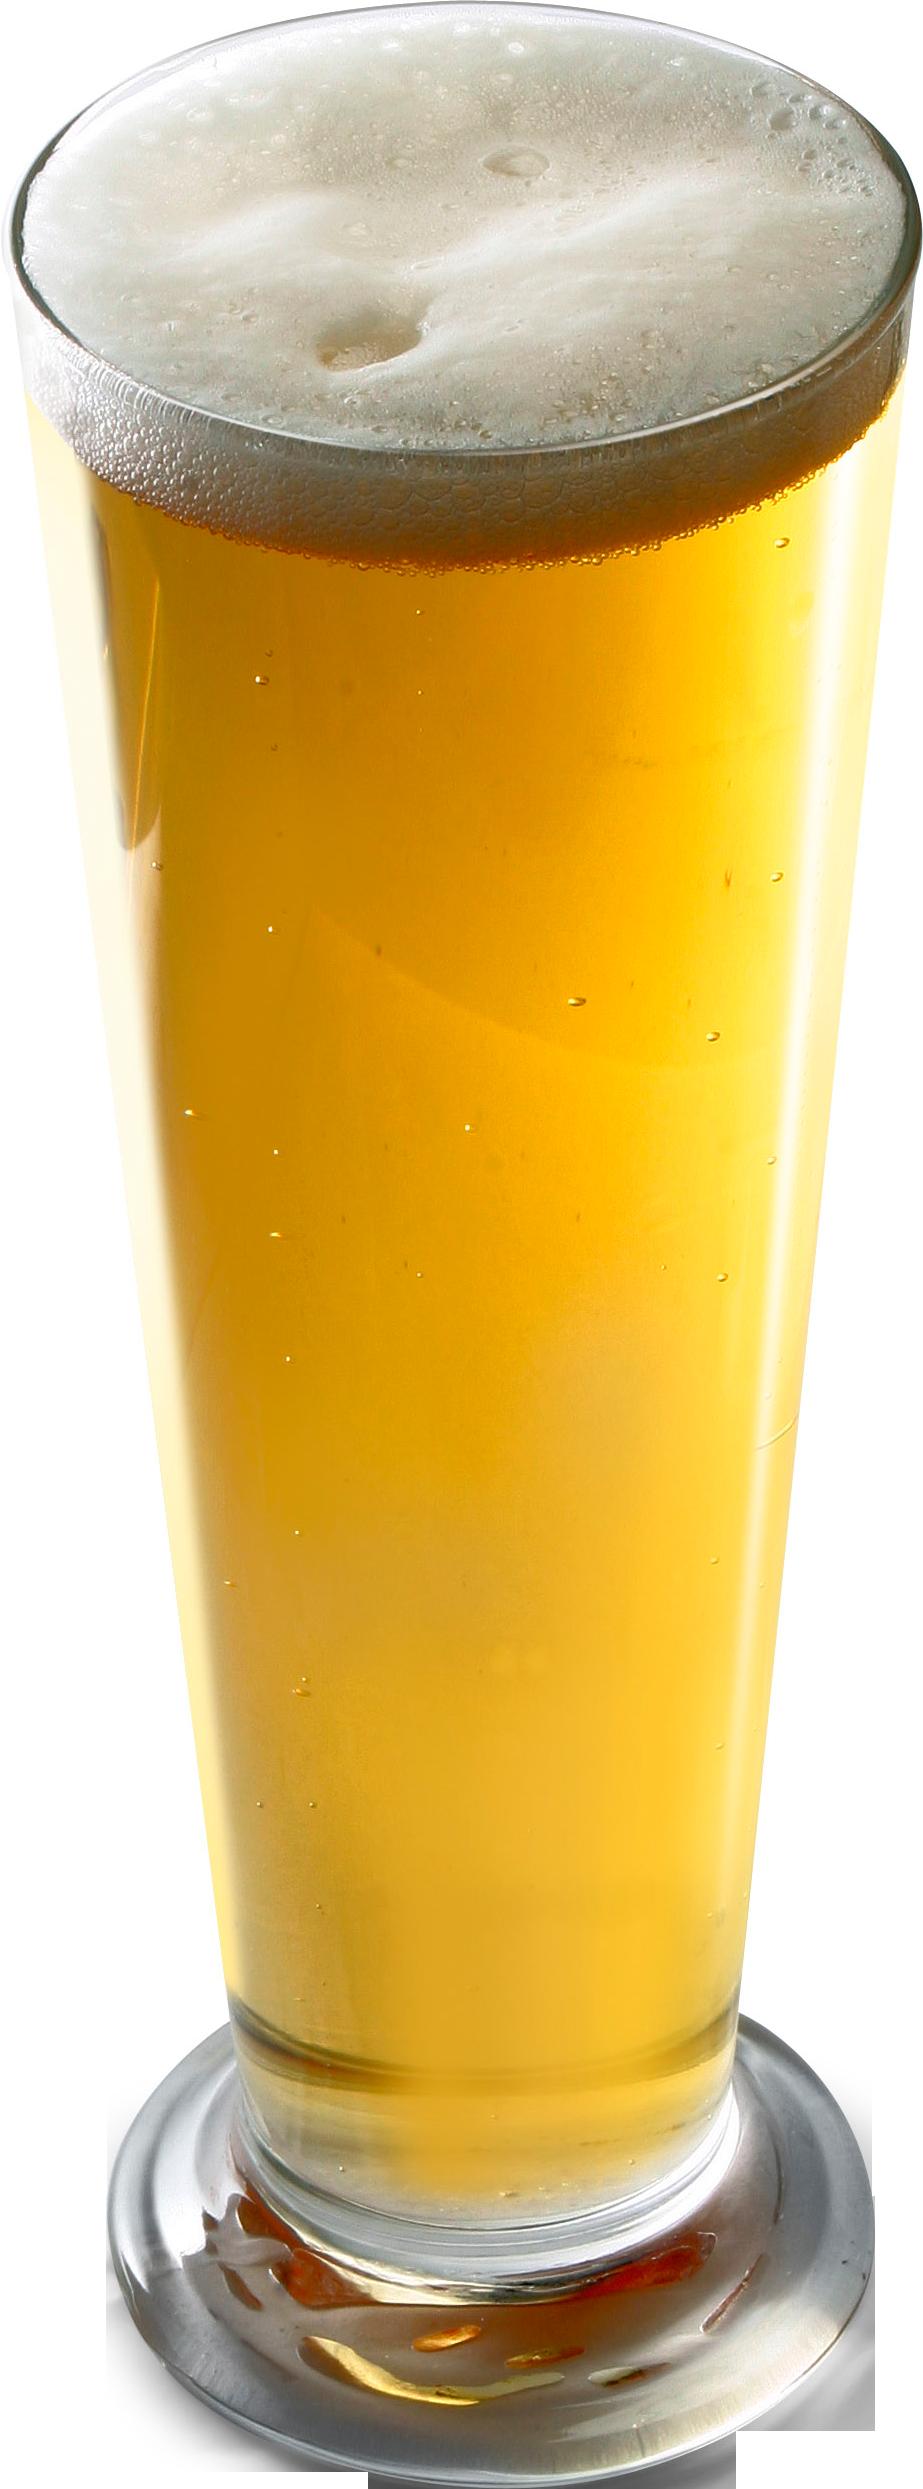 Ale Beer In A Pint Png Mockup Free Image By Rawpixel Com Fon Ale Beer Beer Png